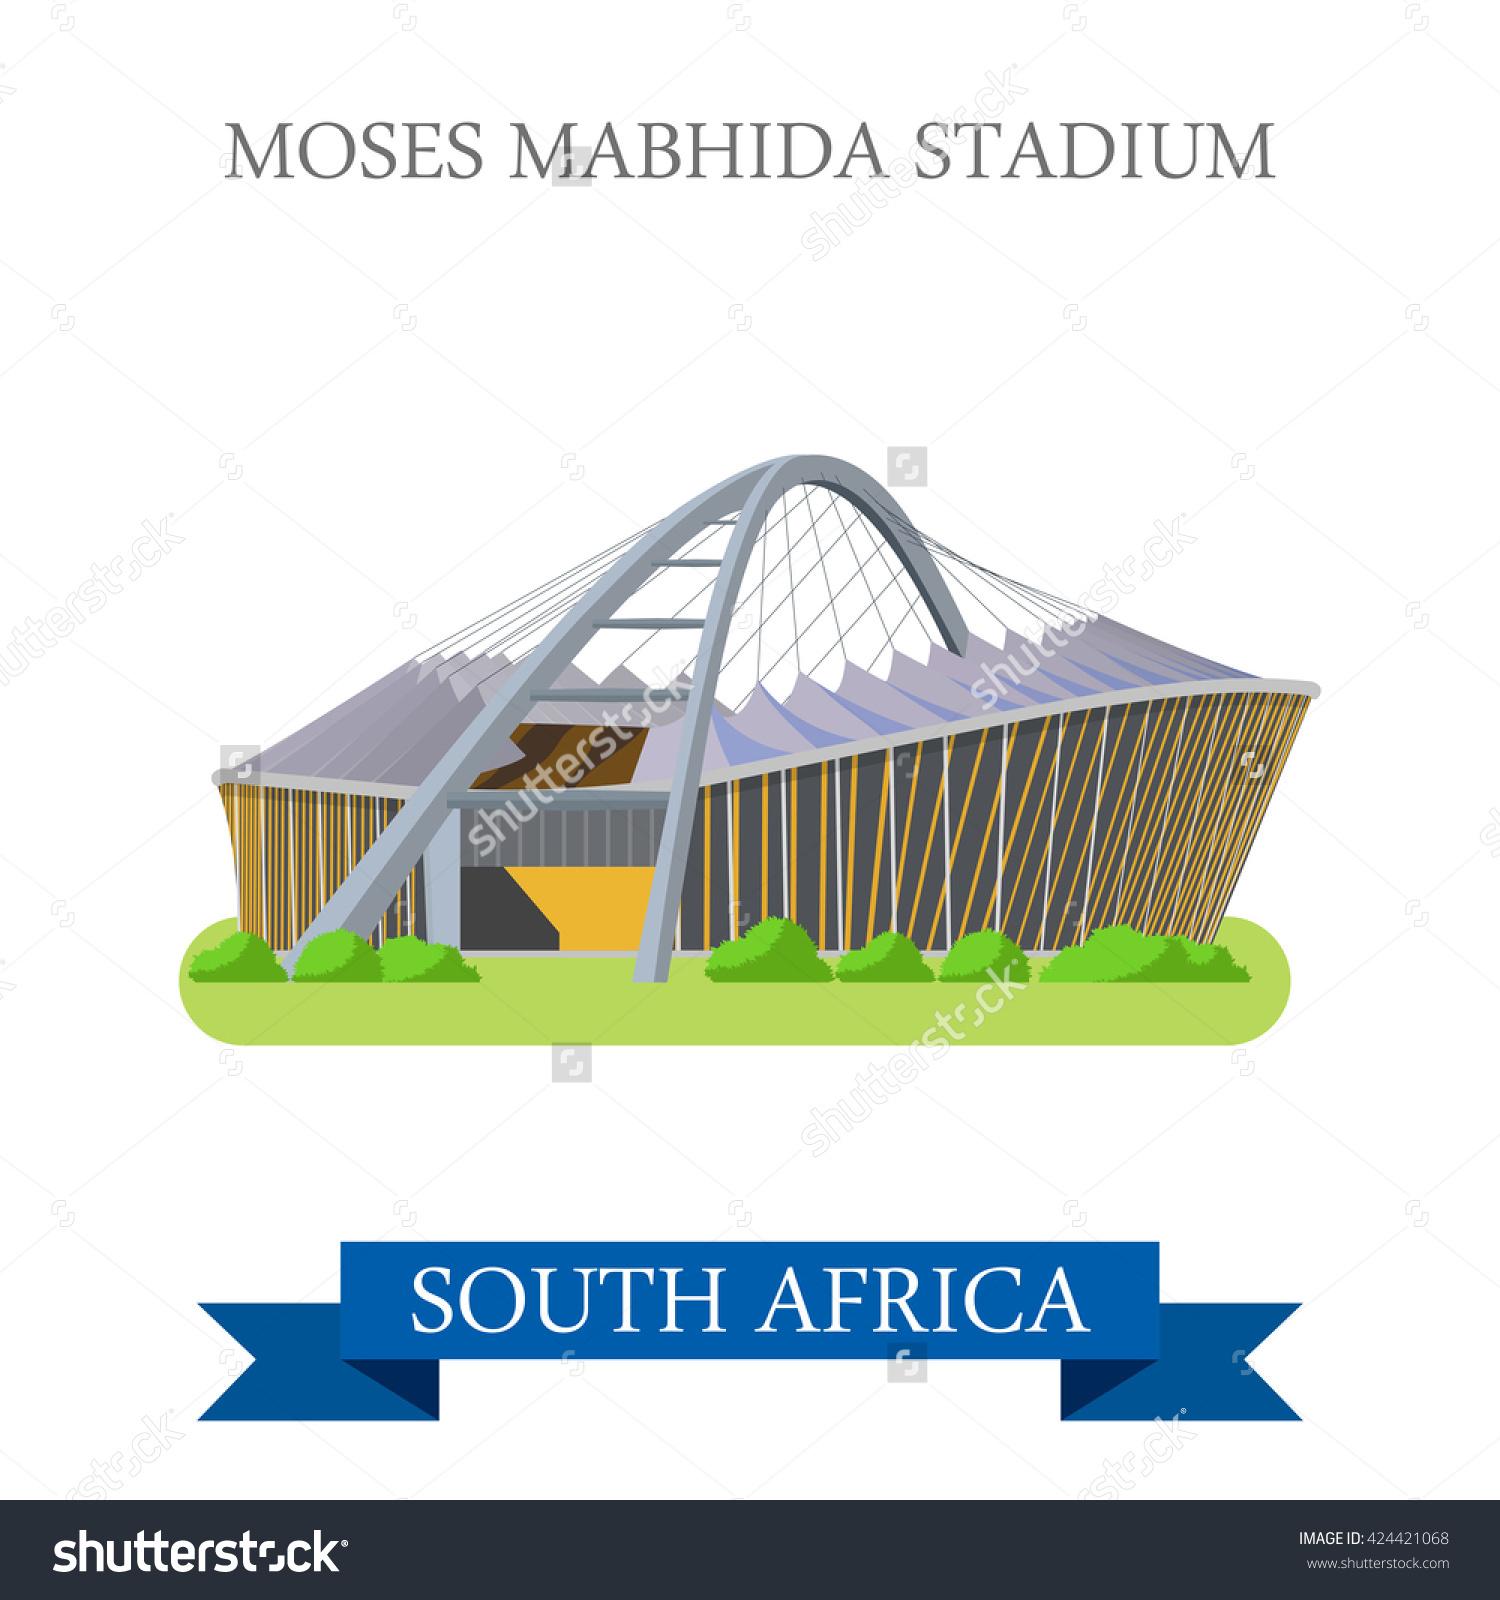 Moses Mabhida Stadium Durban South Africa Stock Vector 424421068.